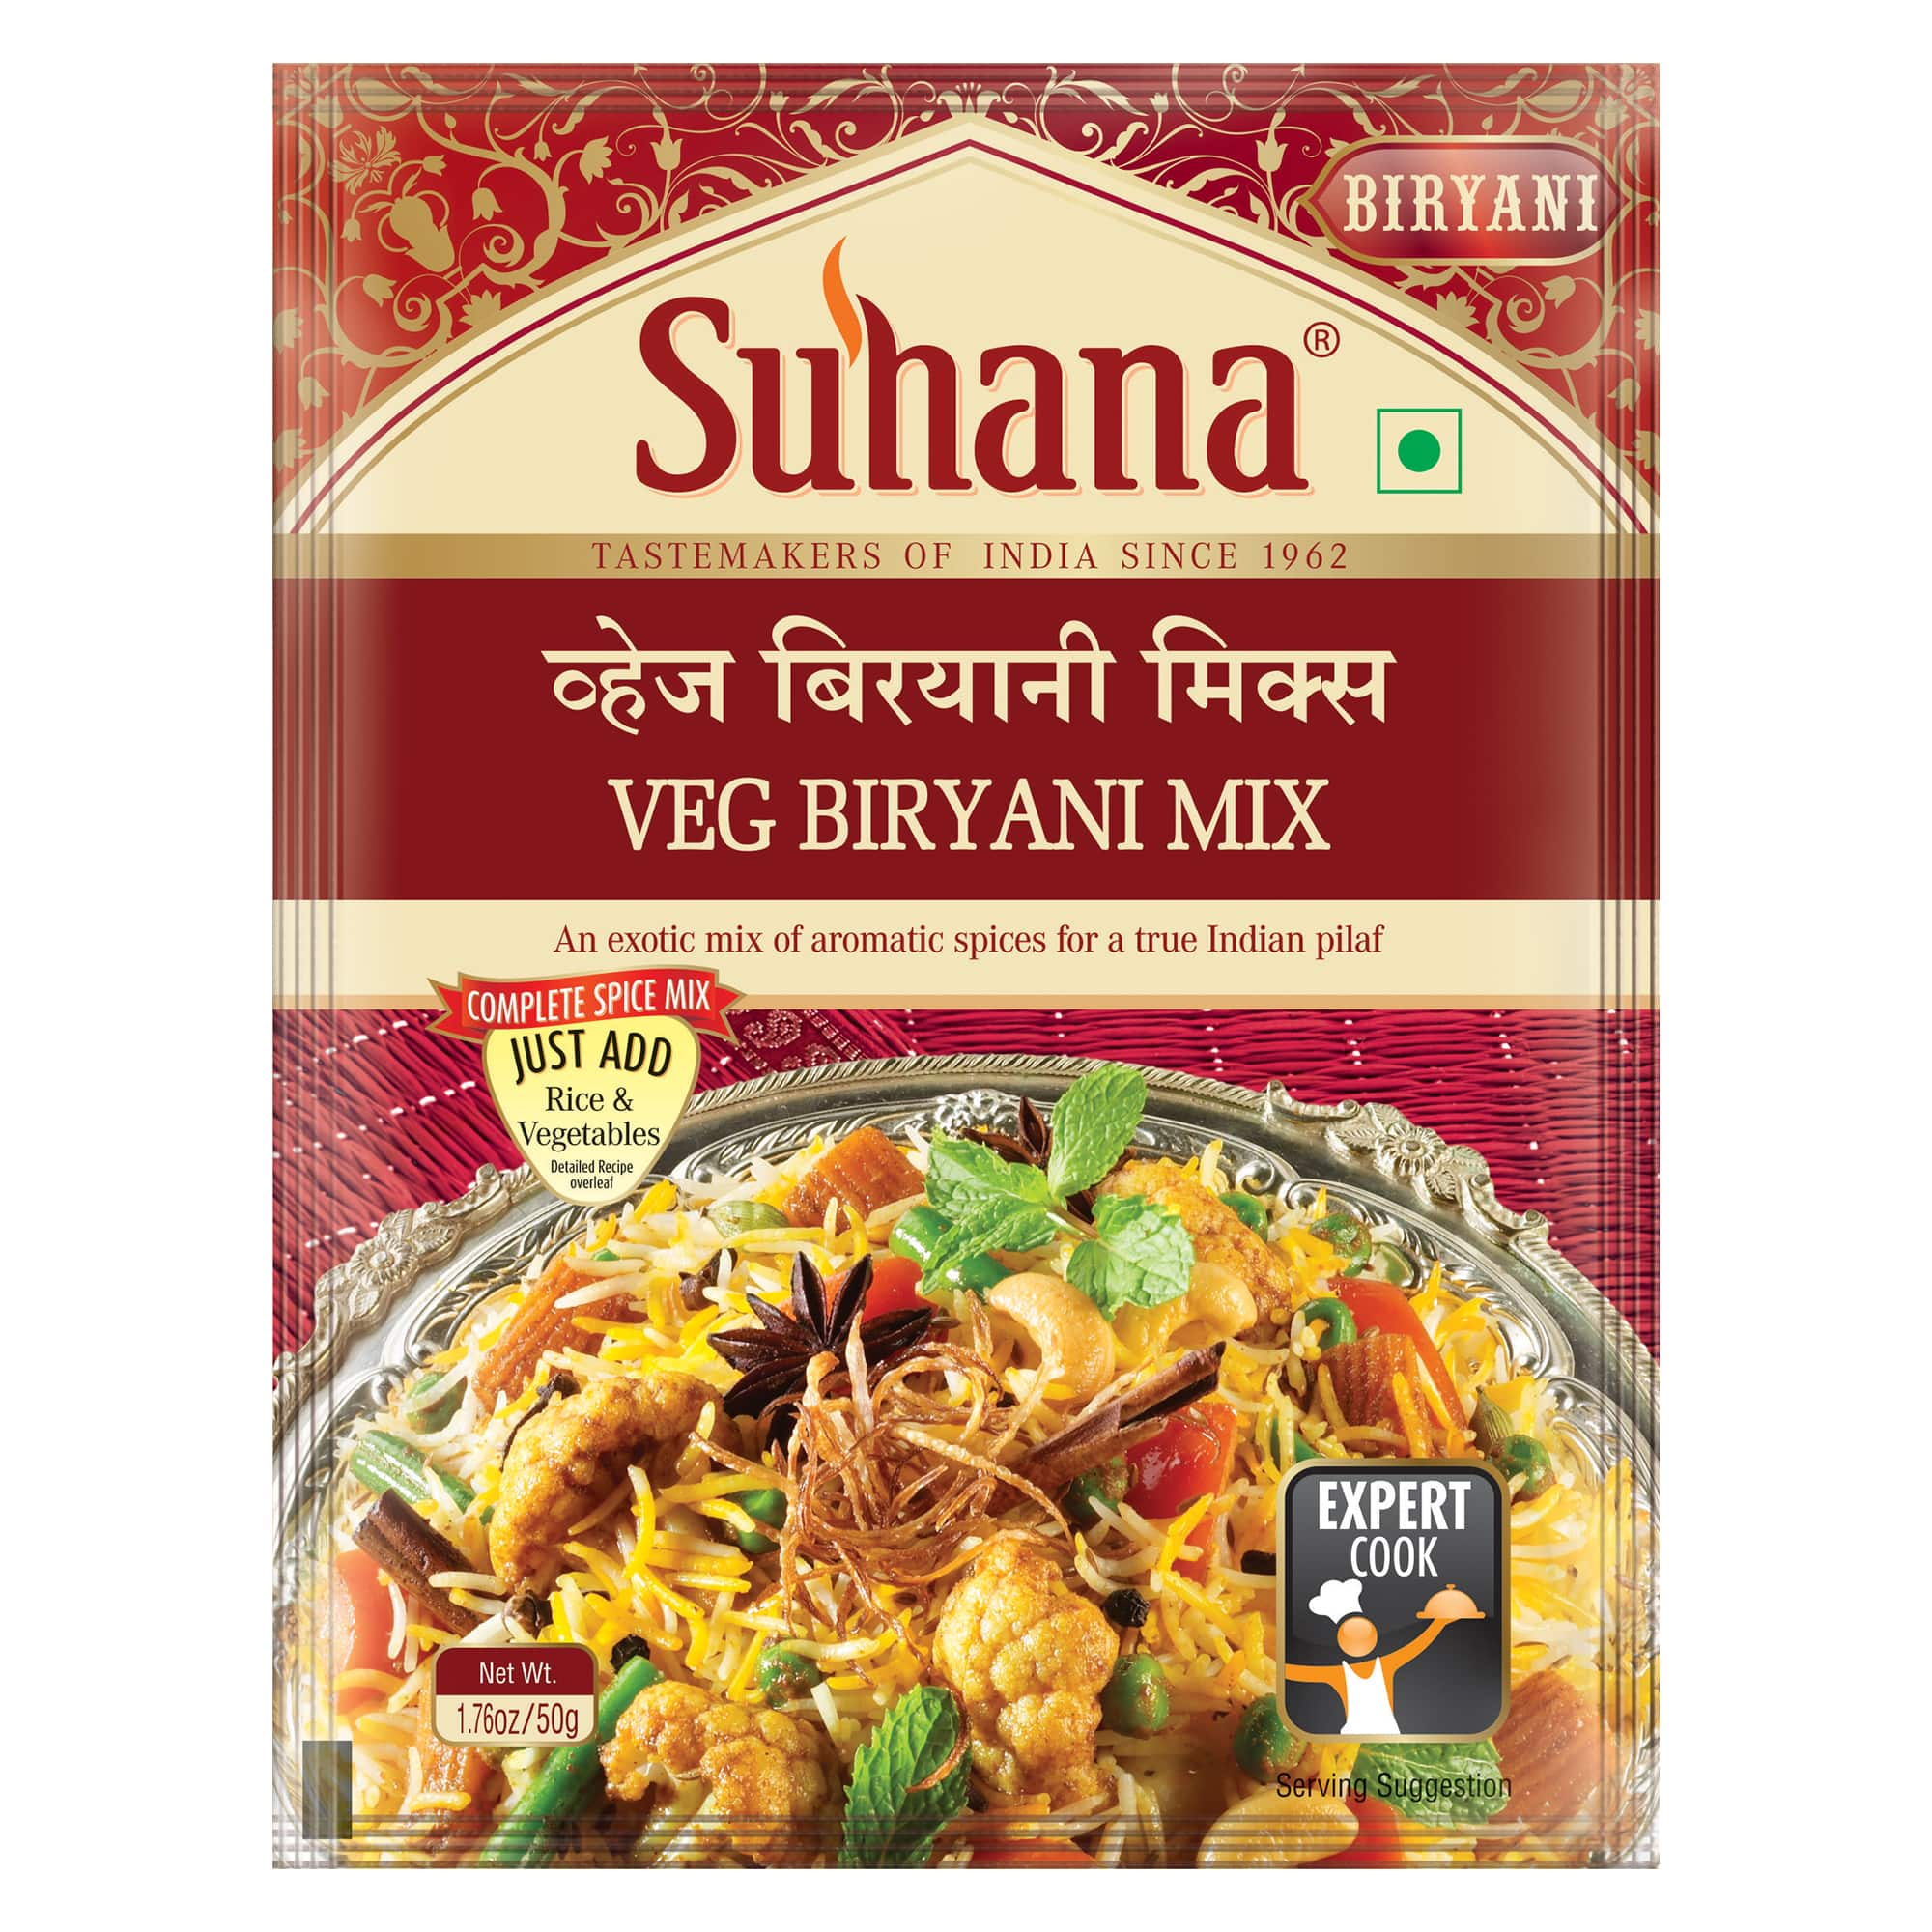 Suhana Veg Biryani Spice Mix 50 g Pouch